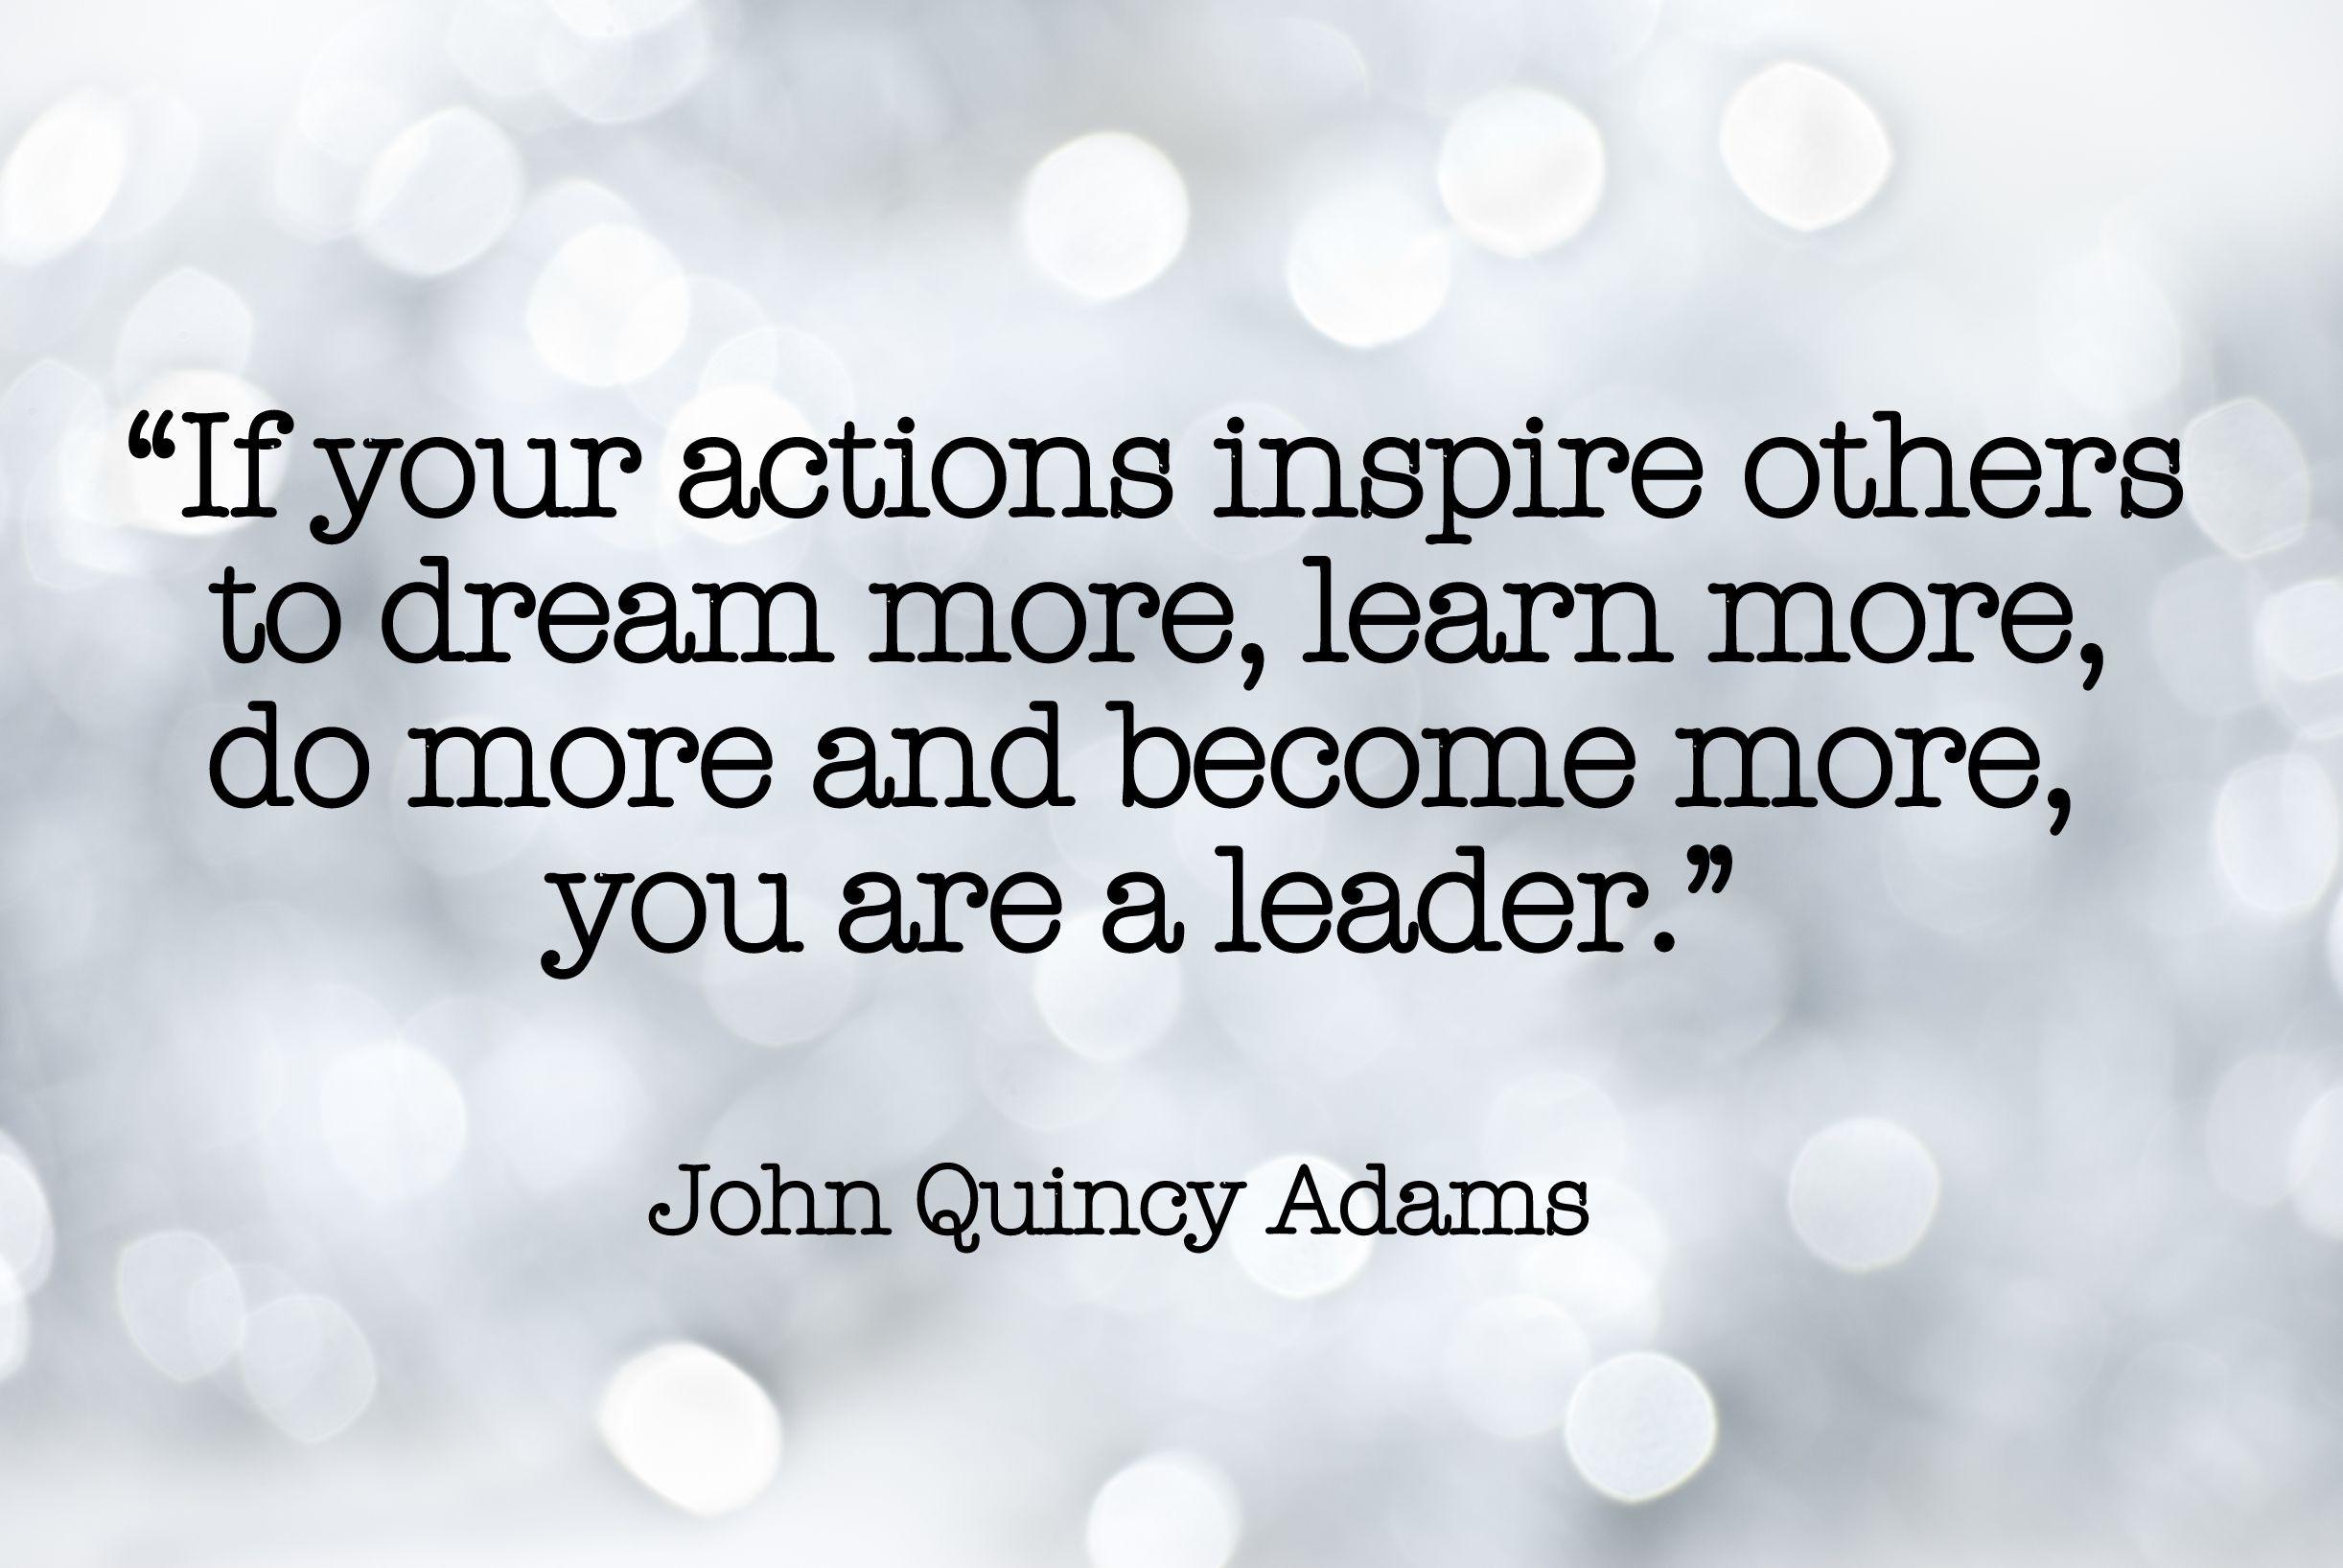 John Adams Quotes On Leadership  Quotations Inspiration leadership 39 RFNDXzAyMzguanBn